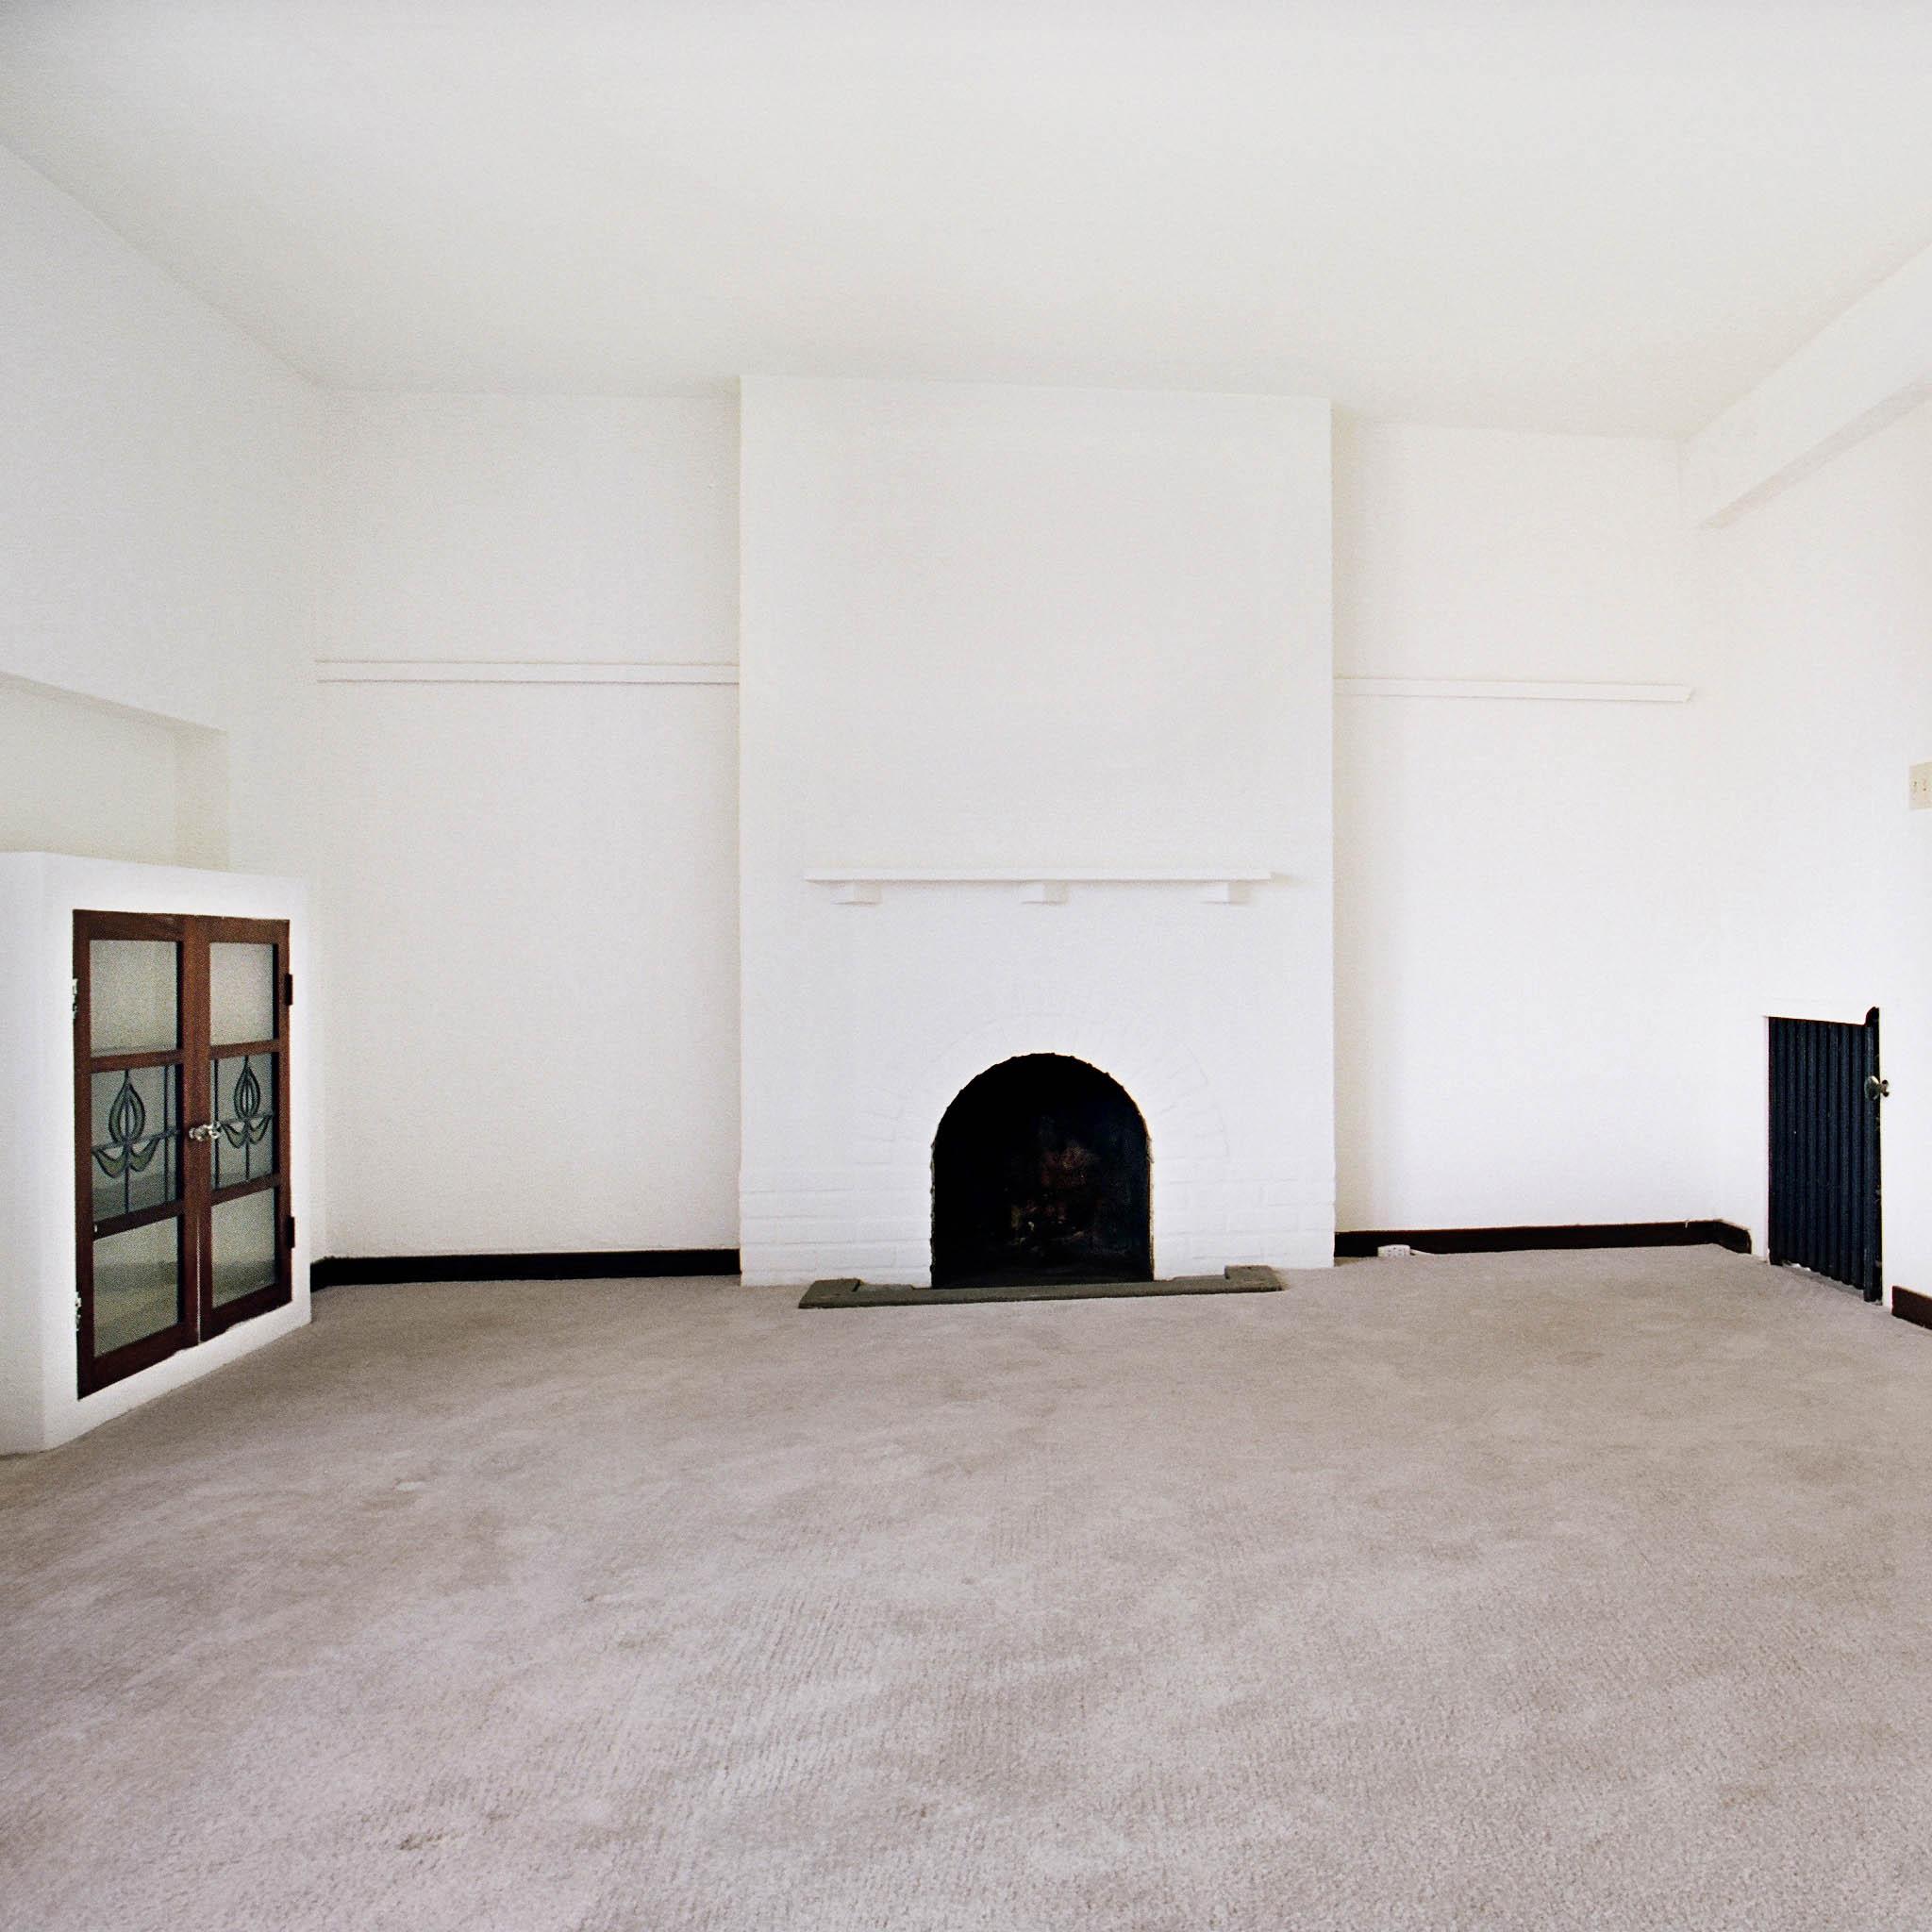 interior of 340 S. Highland Ave, Apt. 7A 2